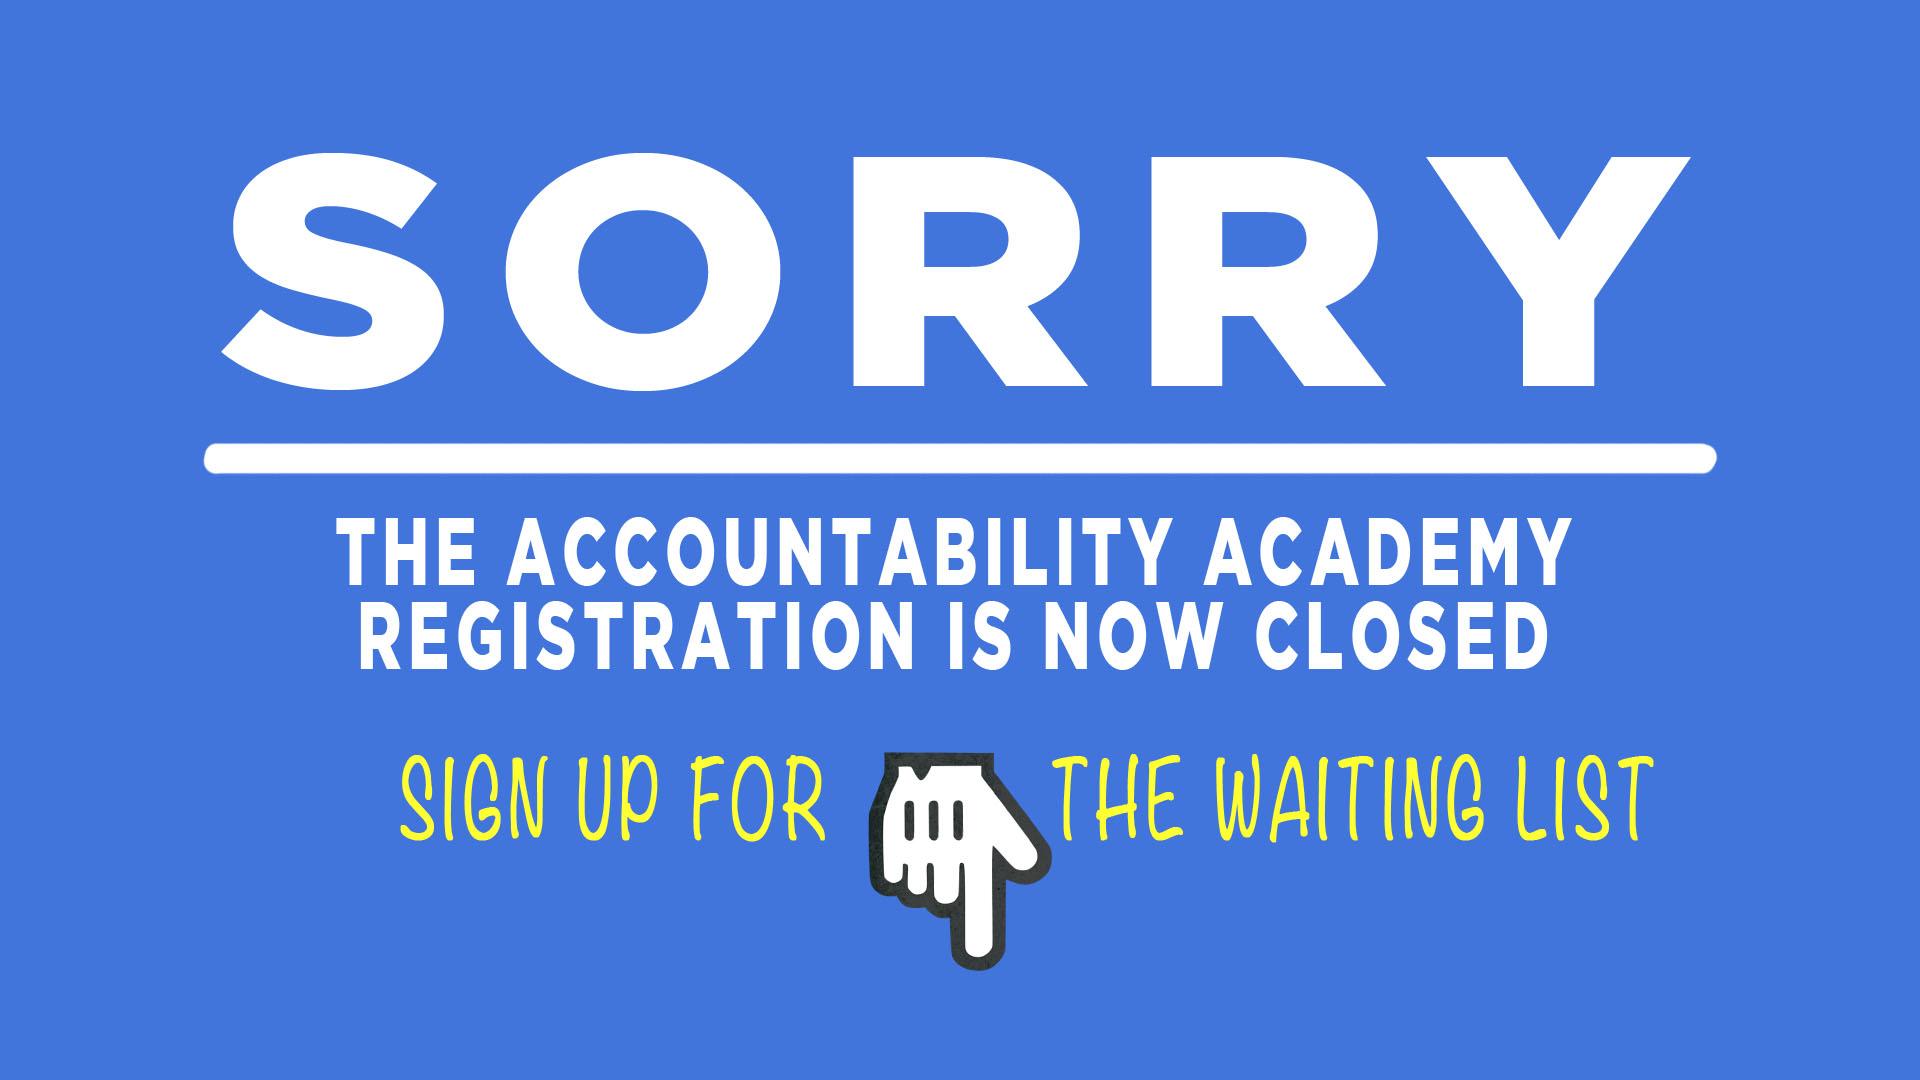 Sorry Academy